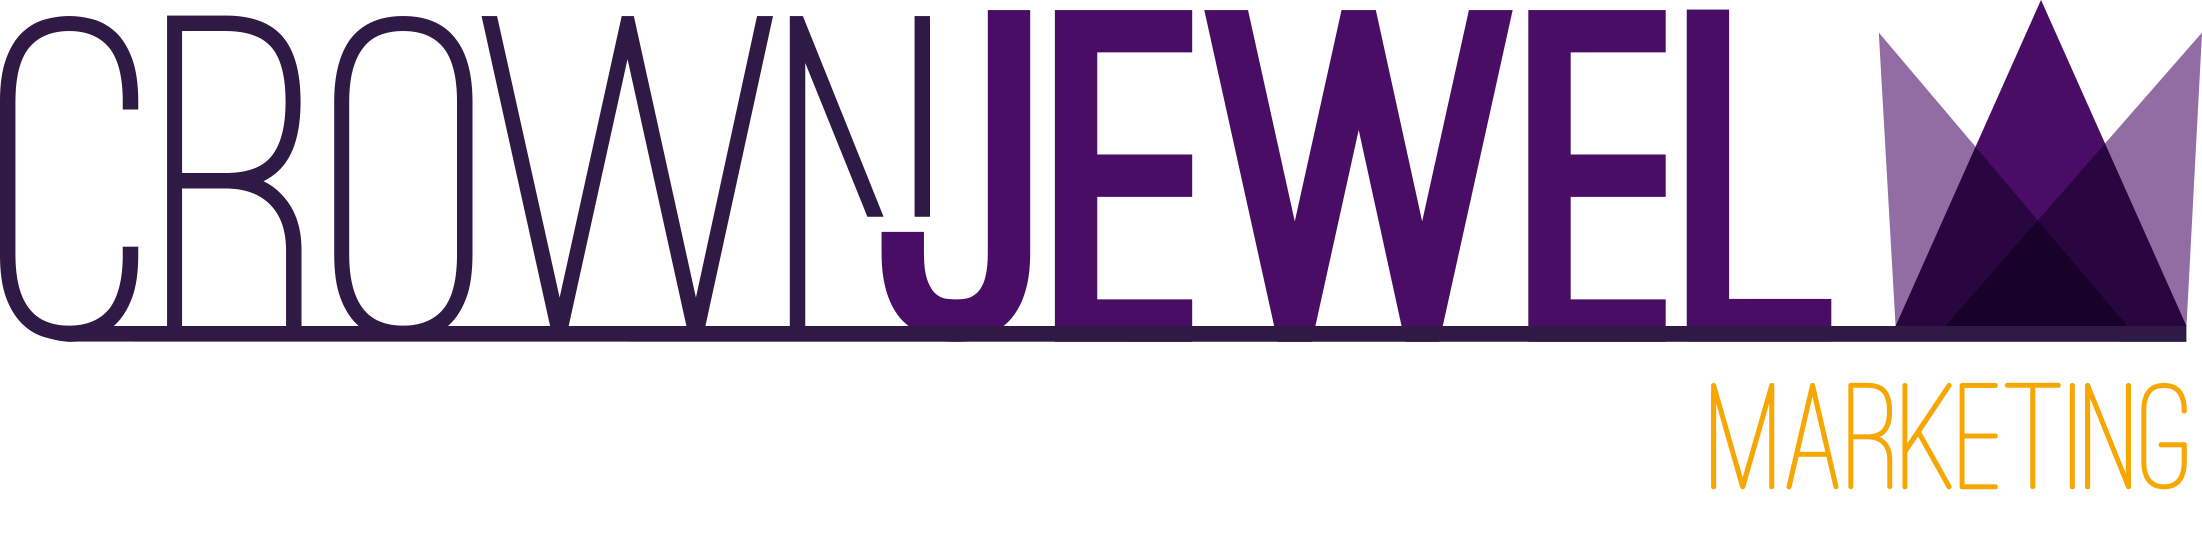 Crown Jewel Marketing